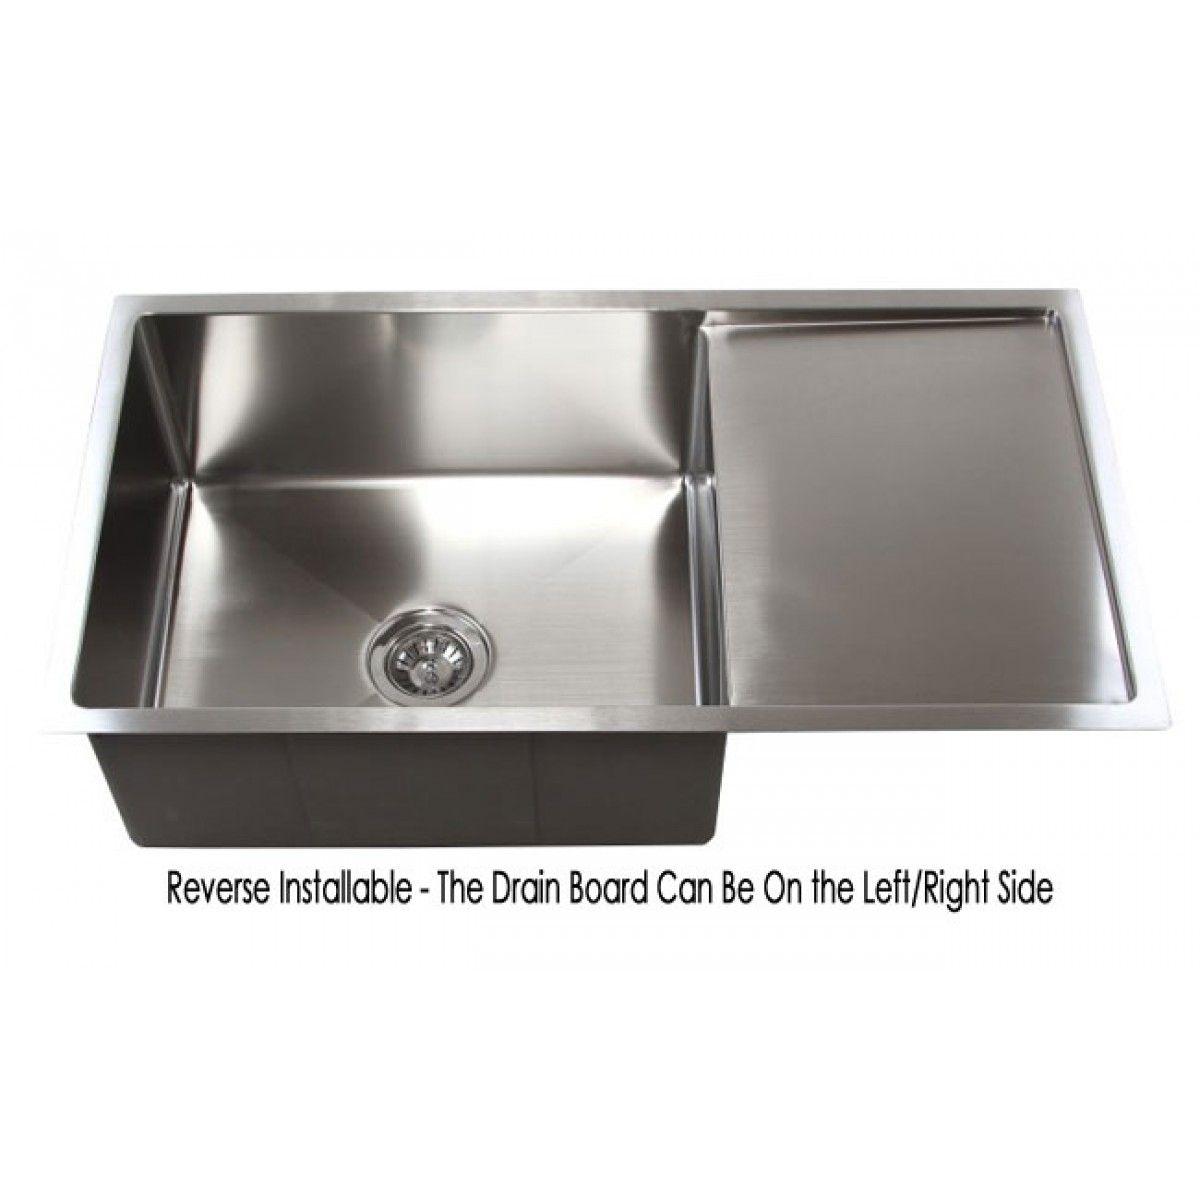 Corstone undermount kitchen sinks httpyonkou tei 36 inch stainless steel undermount single bowl kitchen sink with drain board workwithnaturefo